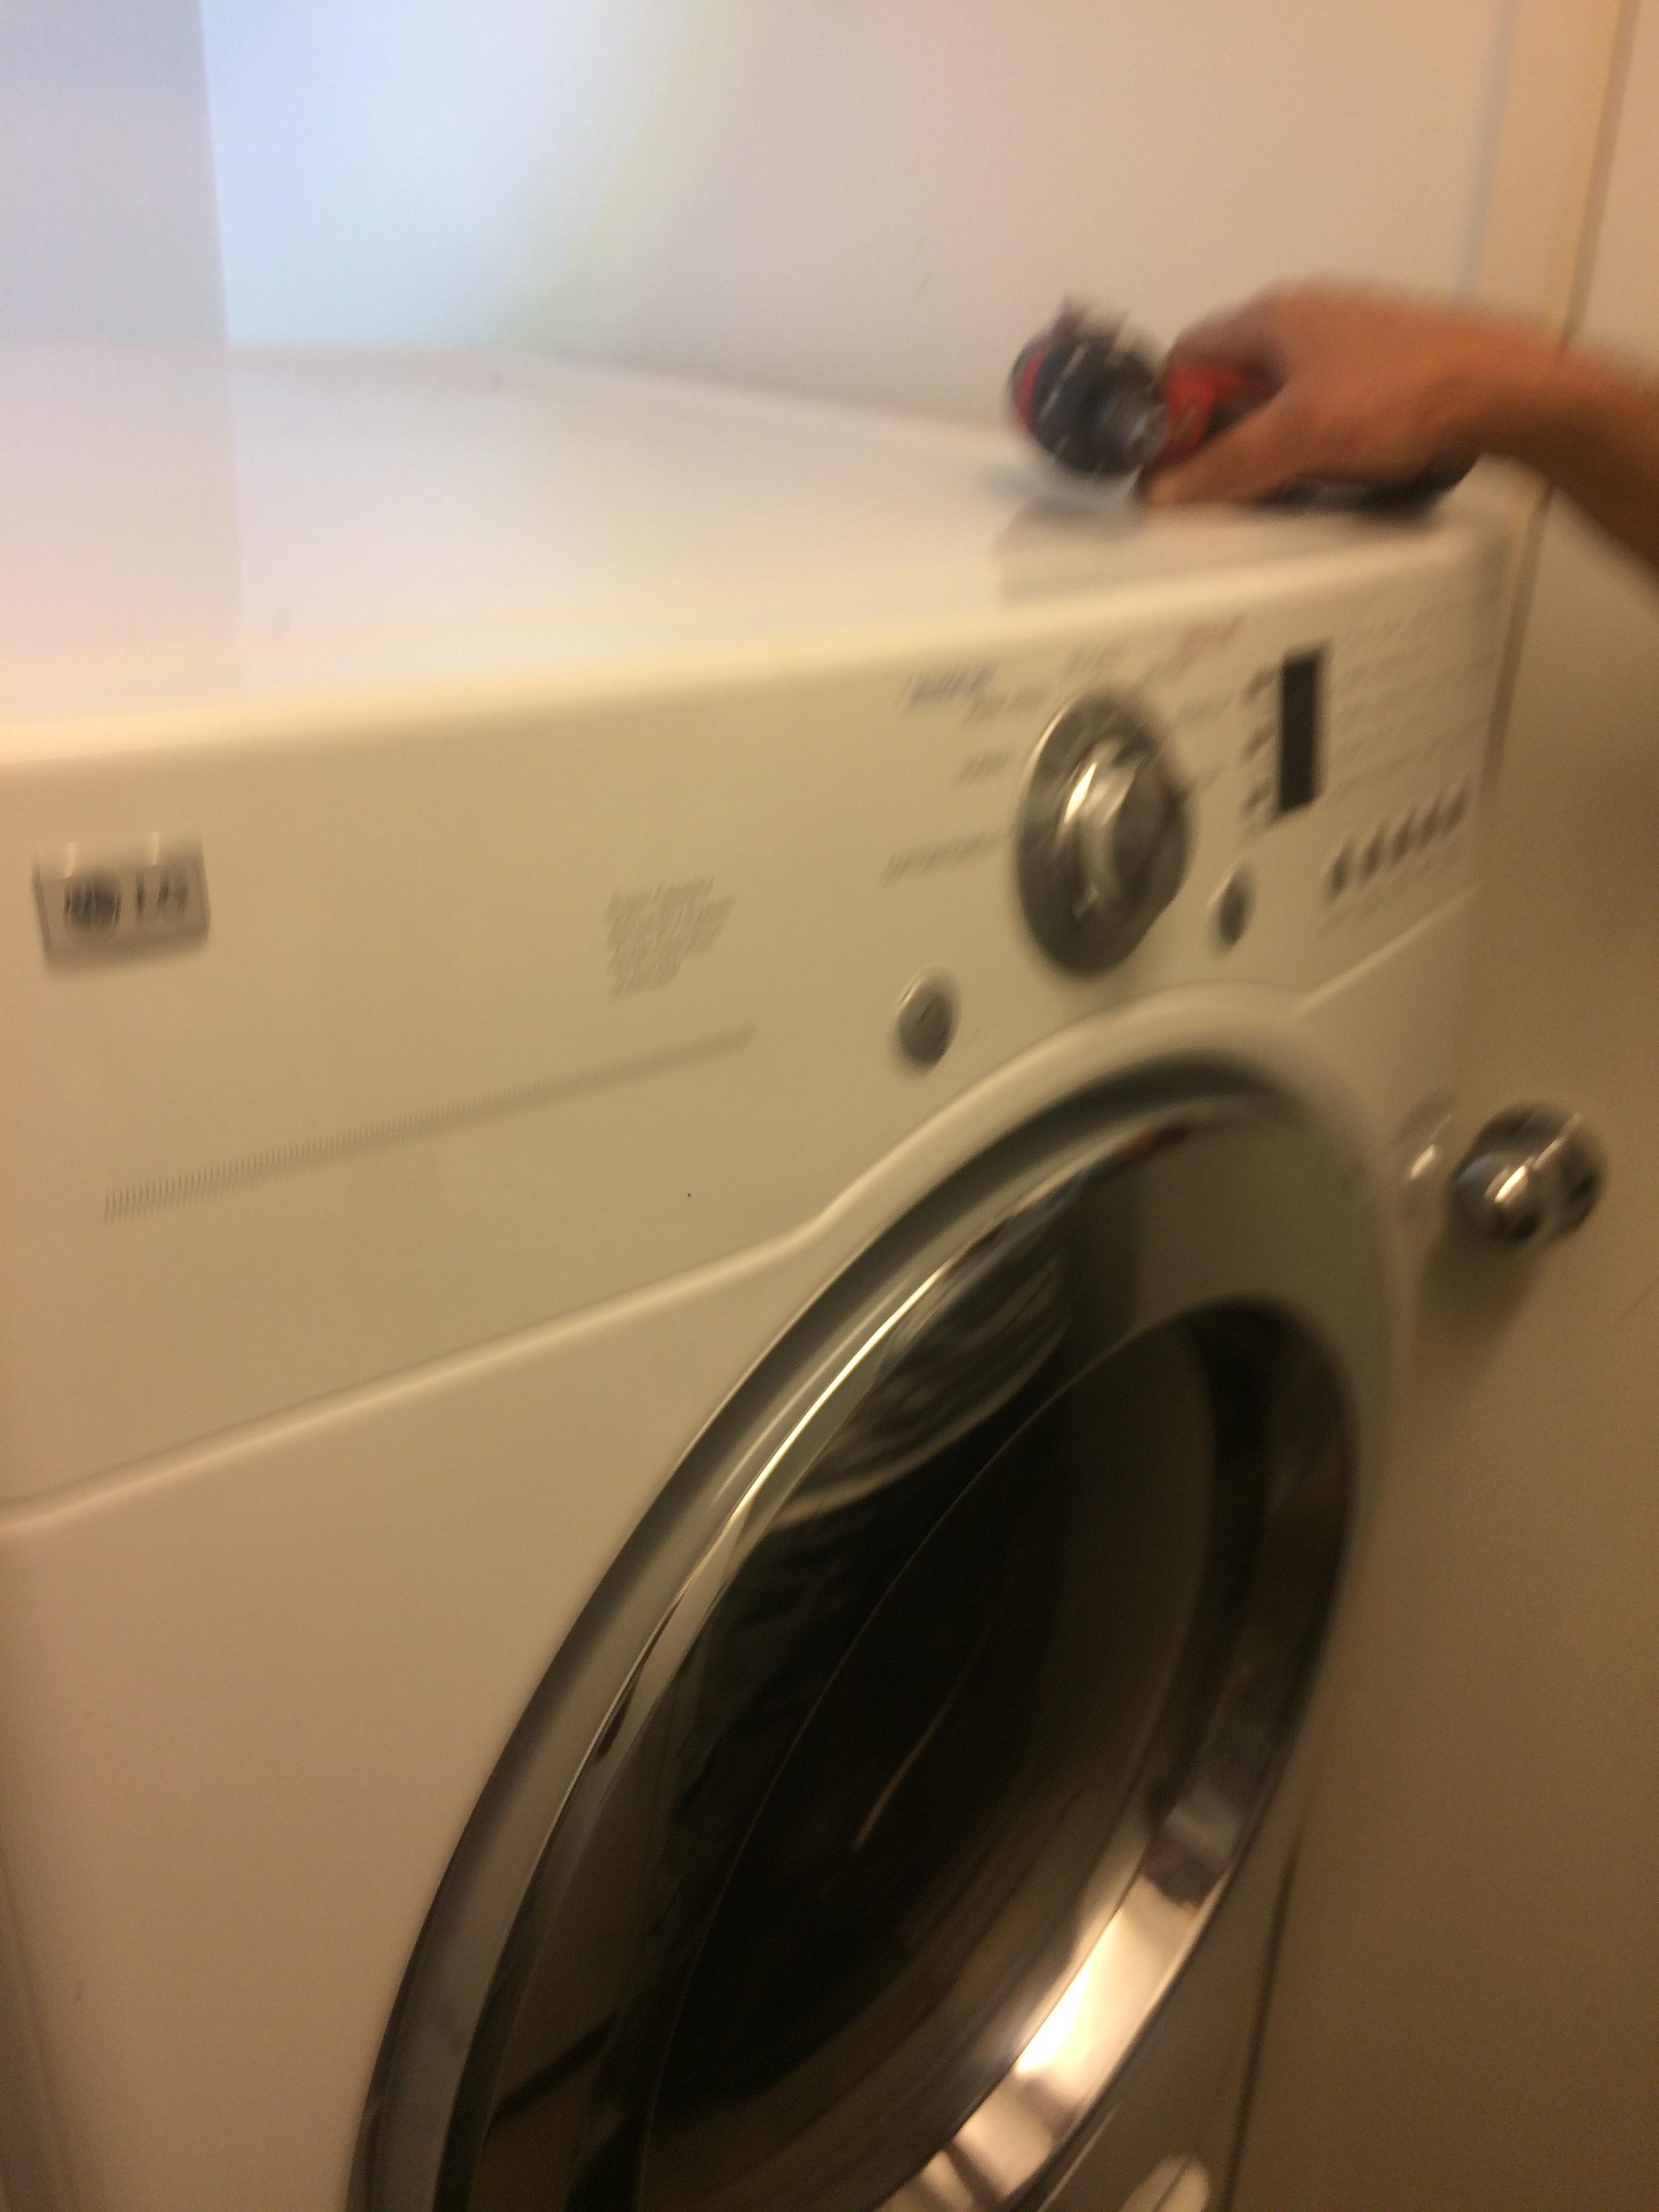 Magic Master Appliance Repair